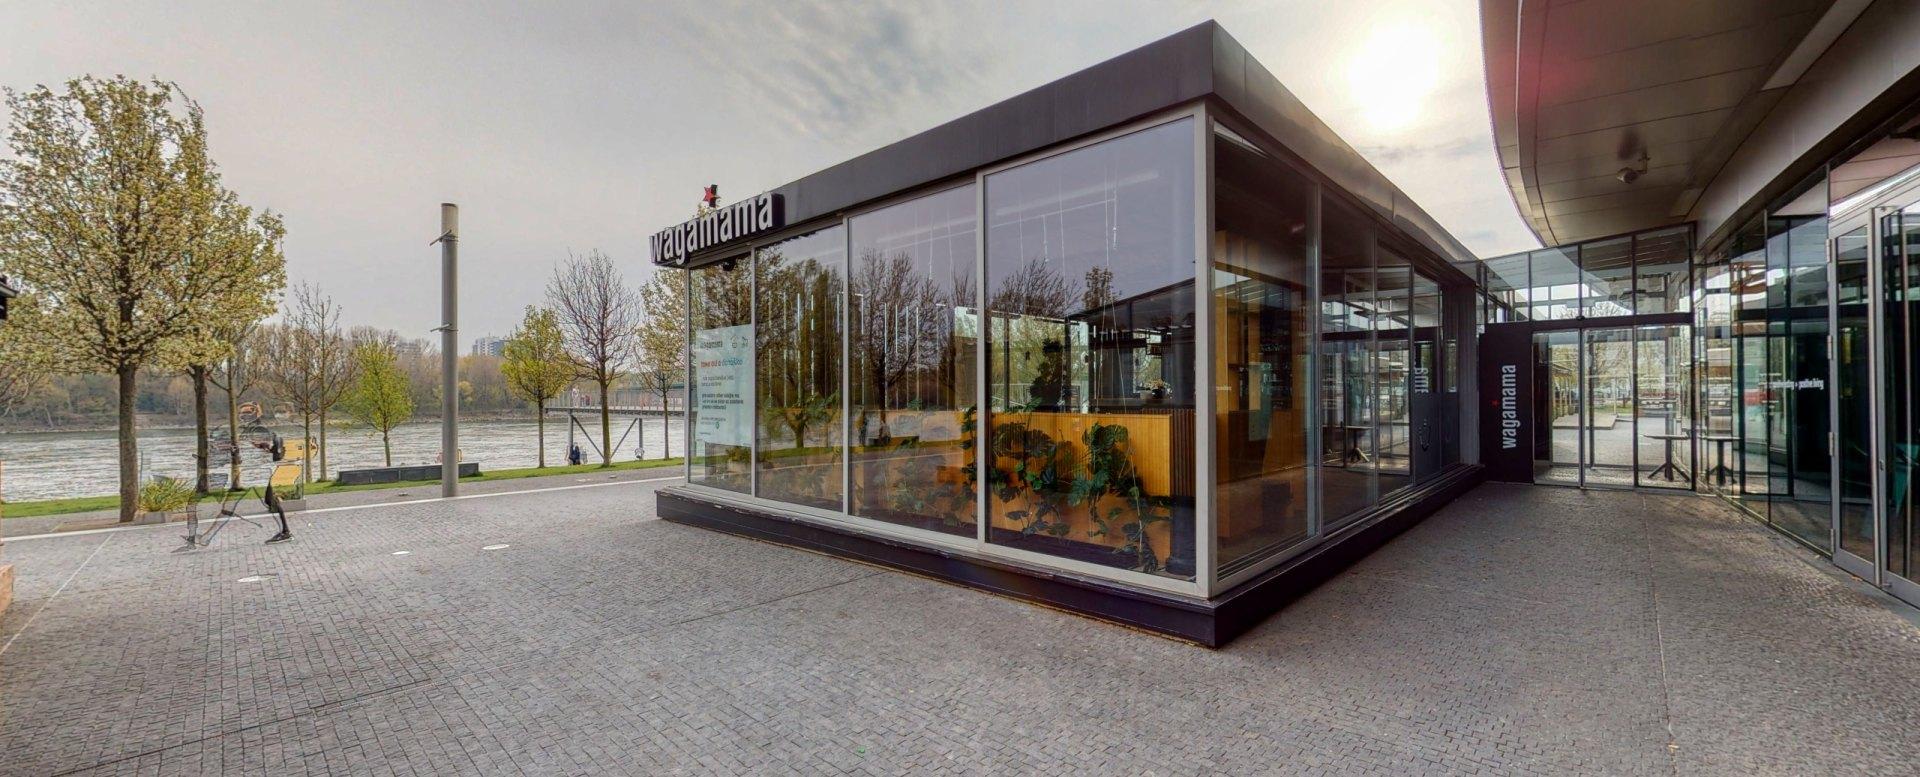 Reštaurácia wagamama v Eurovea a nábrežie Dunaja